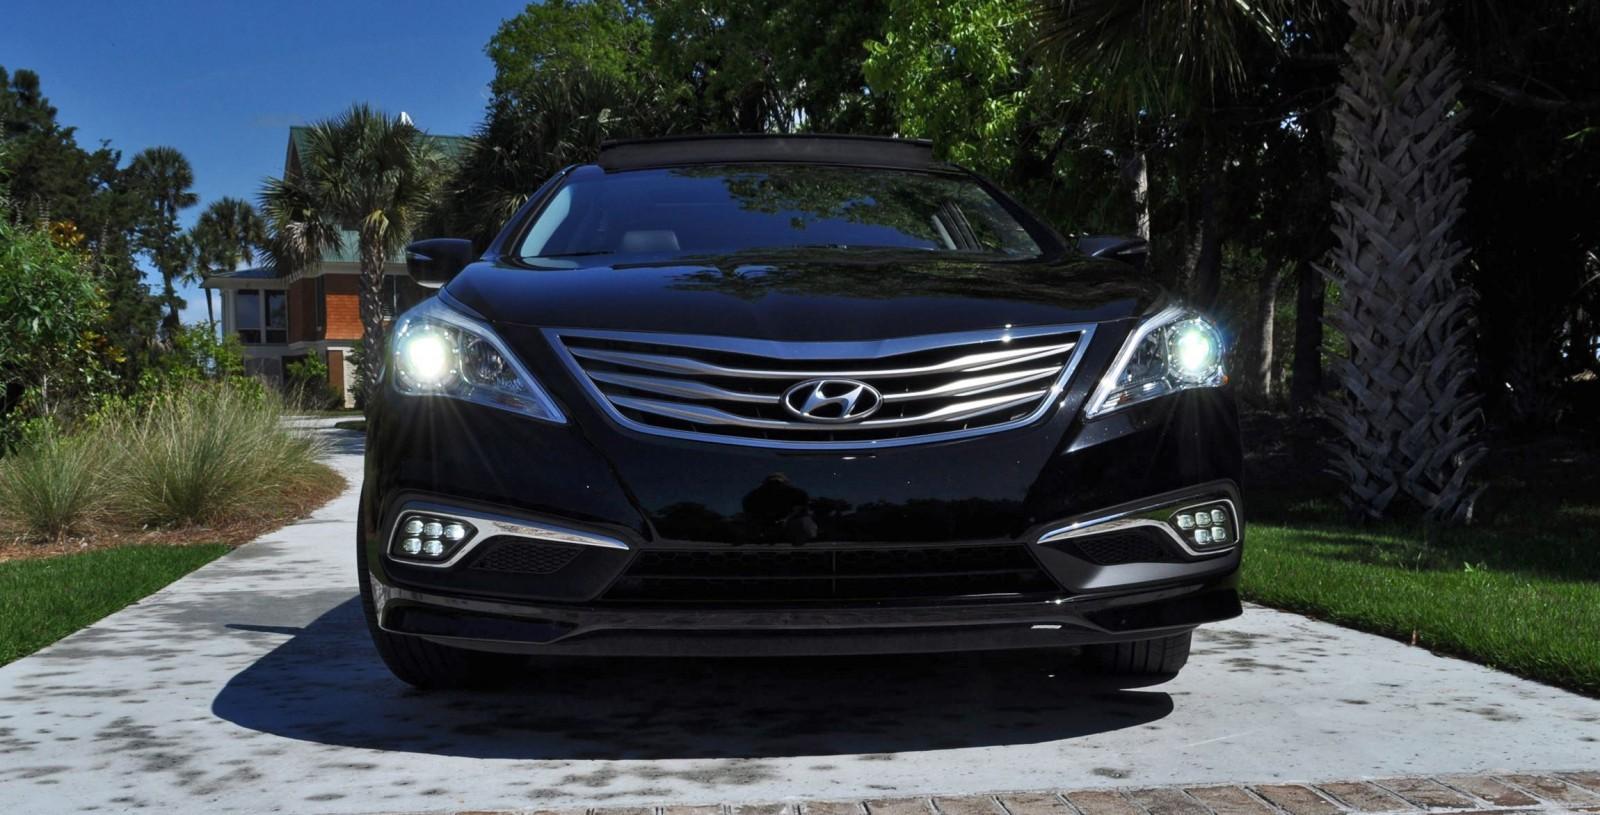 Road Test Review - 2015 Hyundai AZERA Limited 82